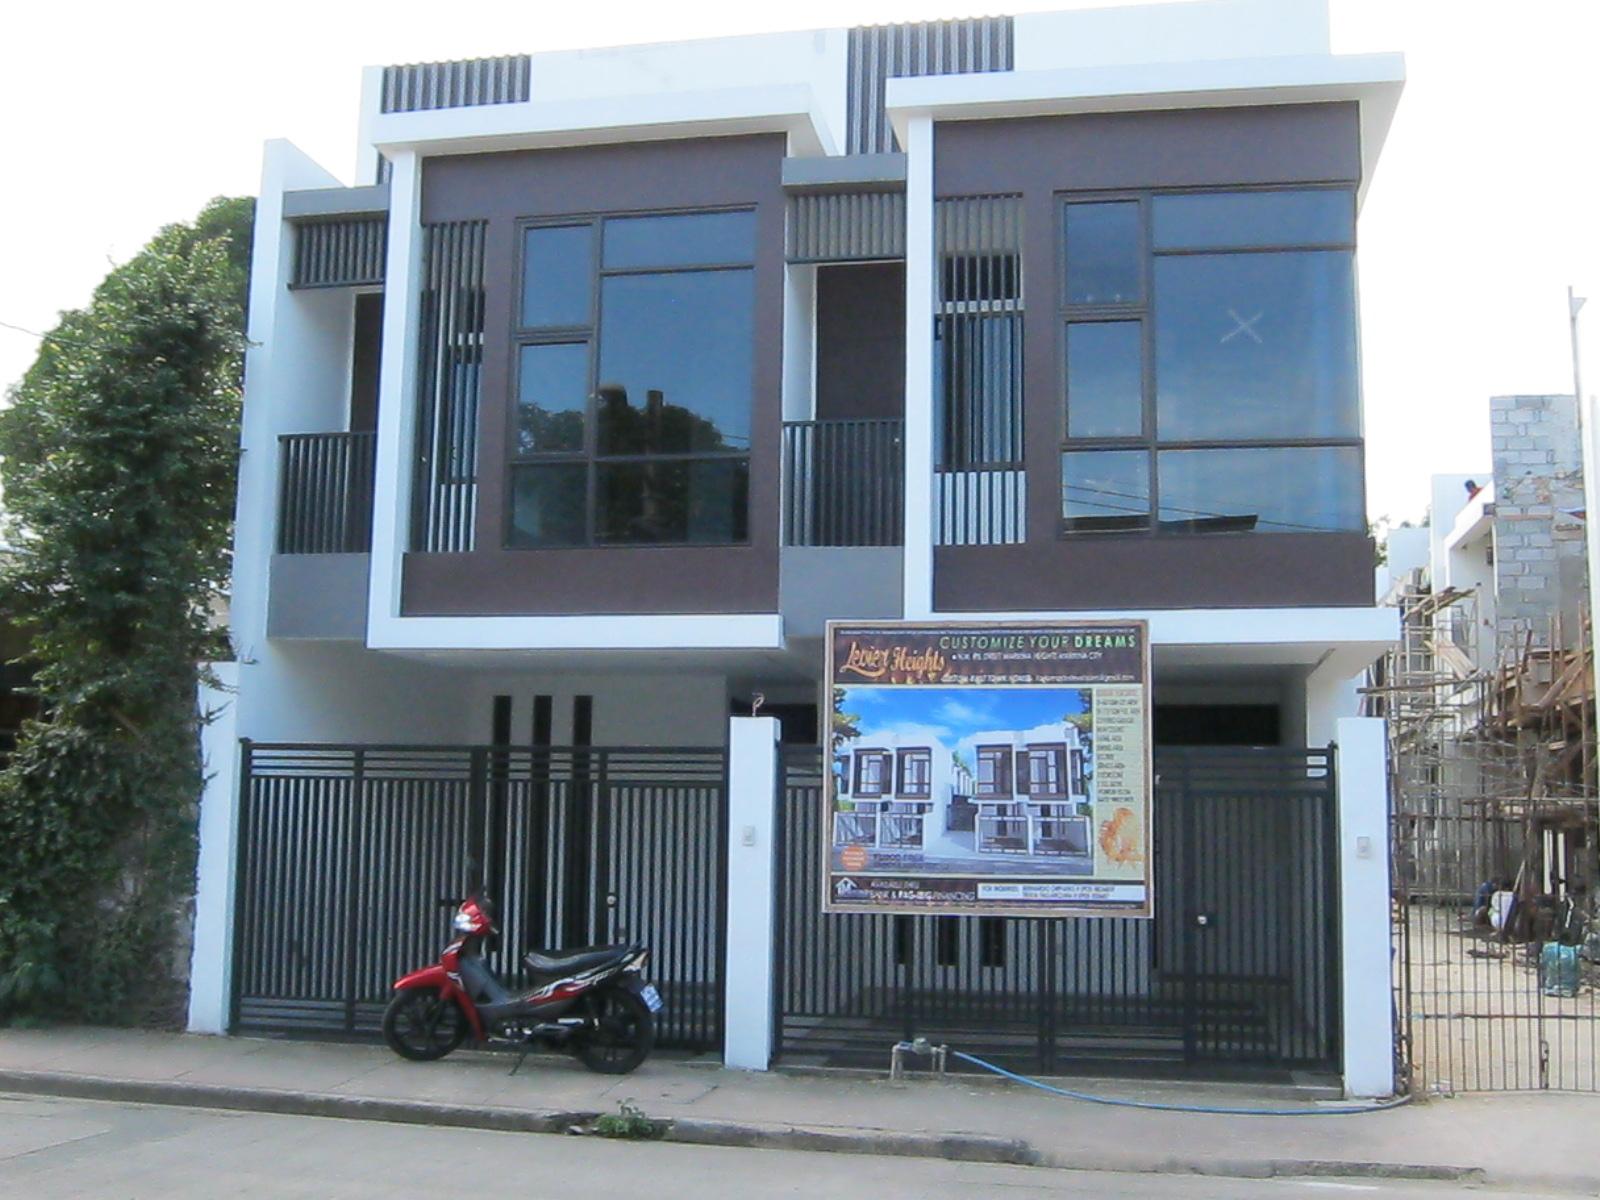 Levier 3 Townhome in Parang, Marikina City